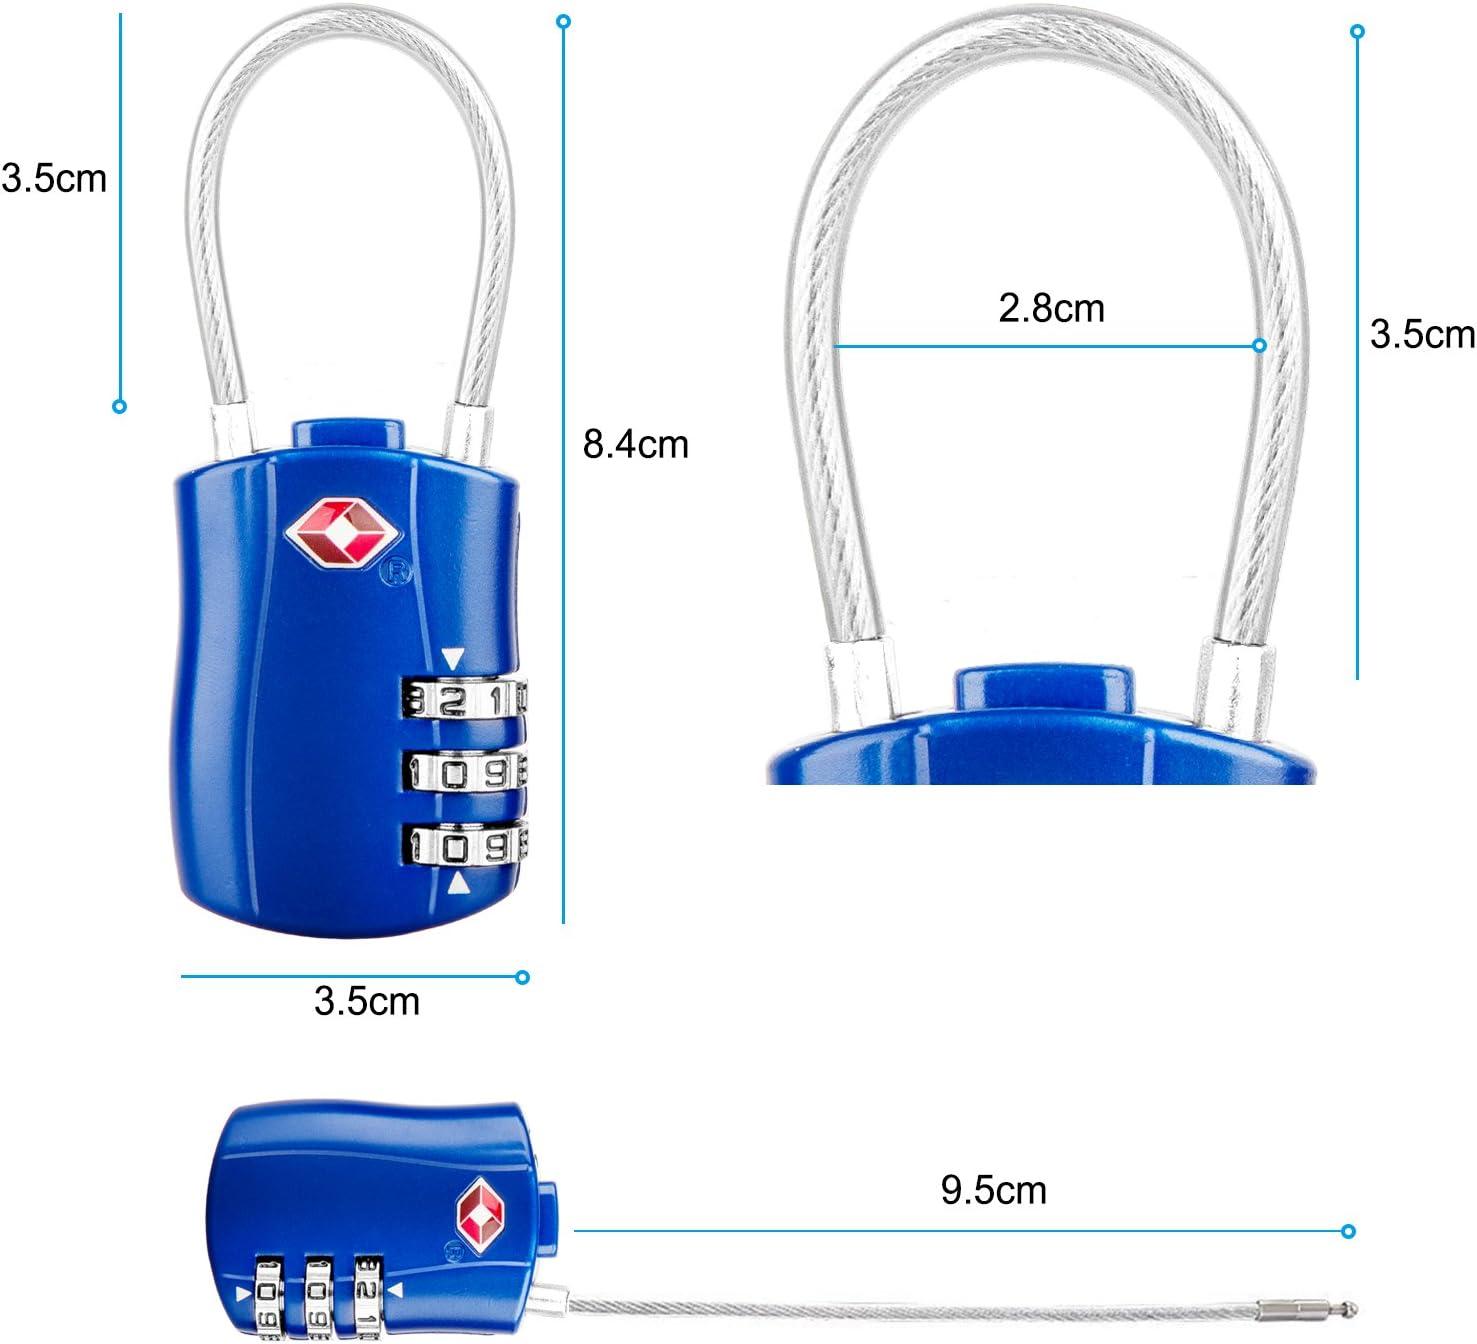 Diyife TSA Luggage Locks, Silver 2 Packs 3-Digit Security Padlock Combination Padlocks Newest Version Code Lock for Travel Suitcases Luggage Bag Case etc